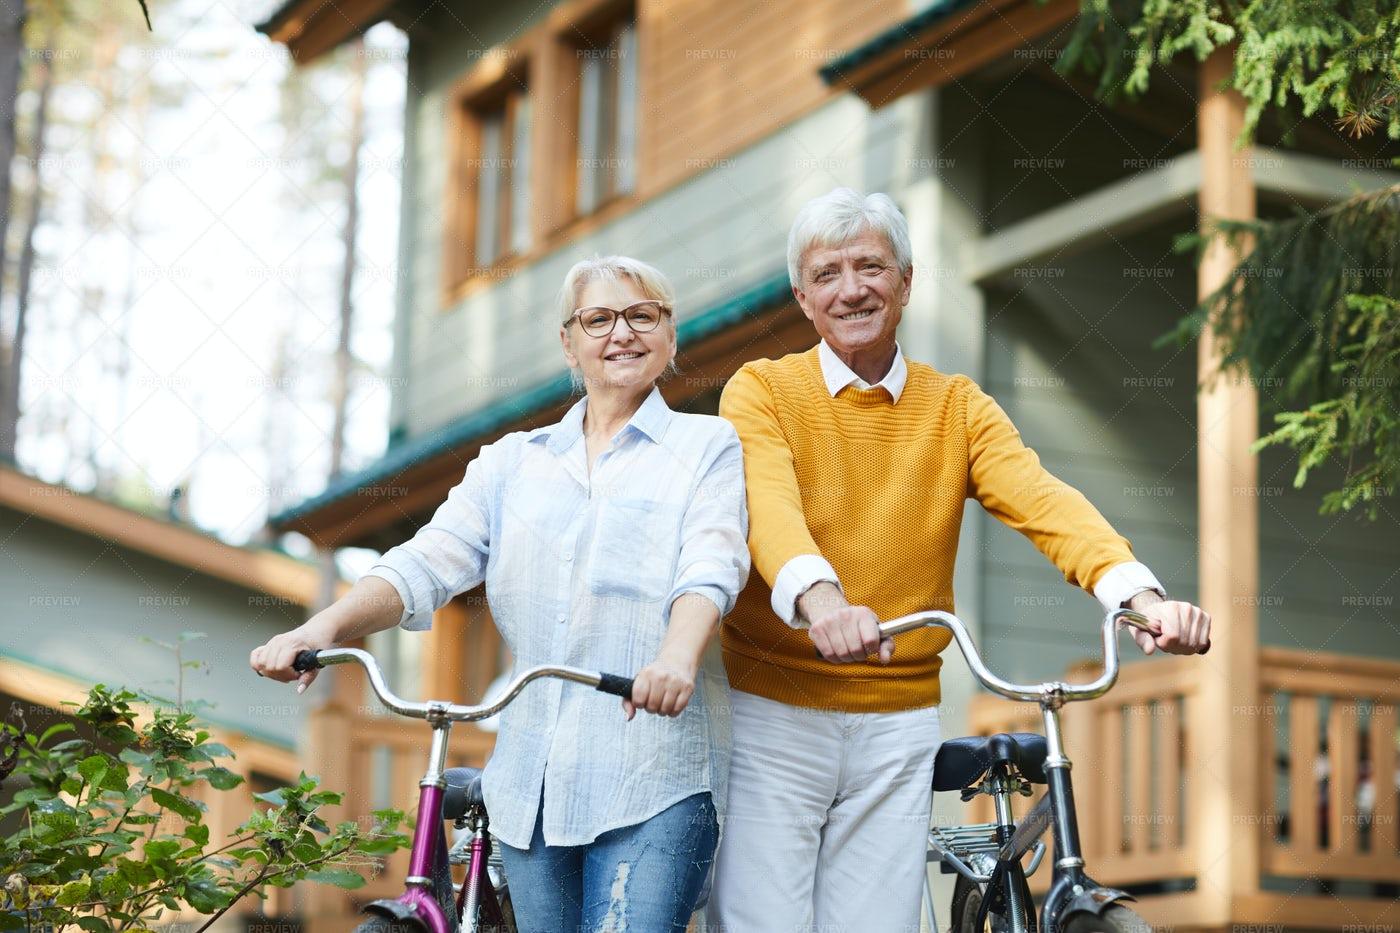 Ctive Senior Couples With Bicycles: Stock Photos